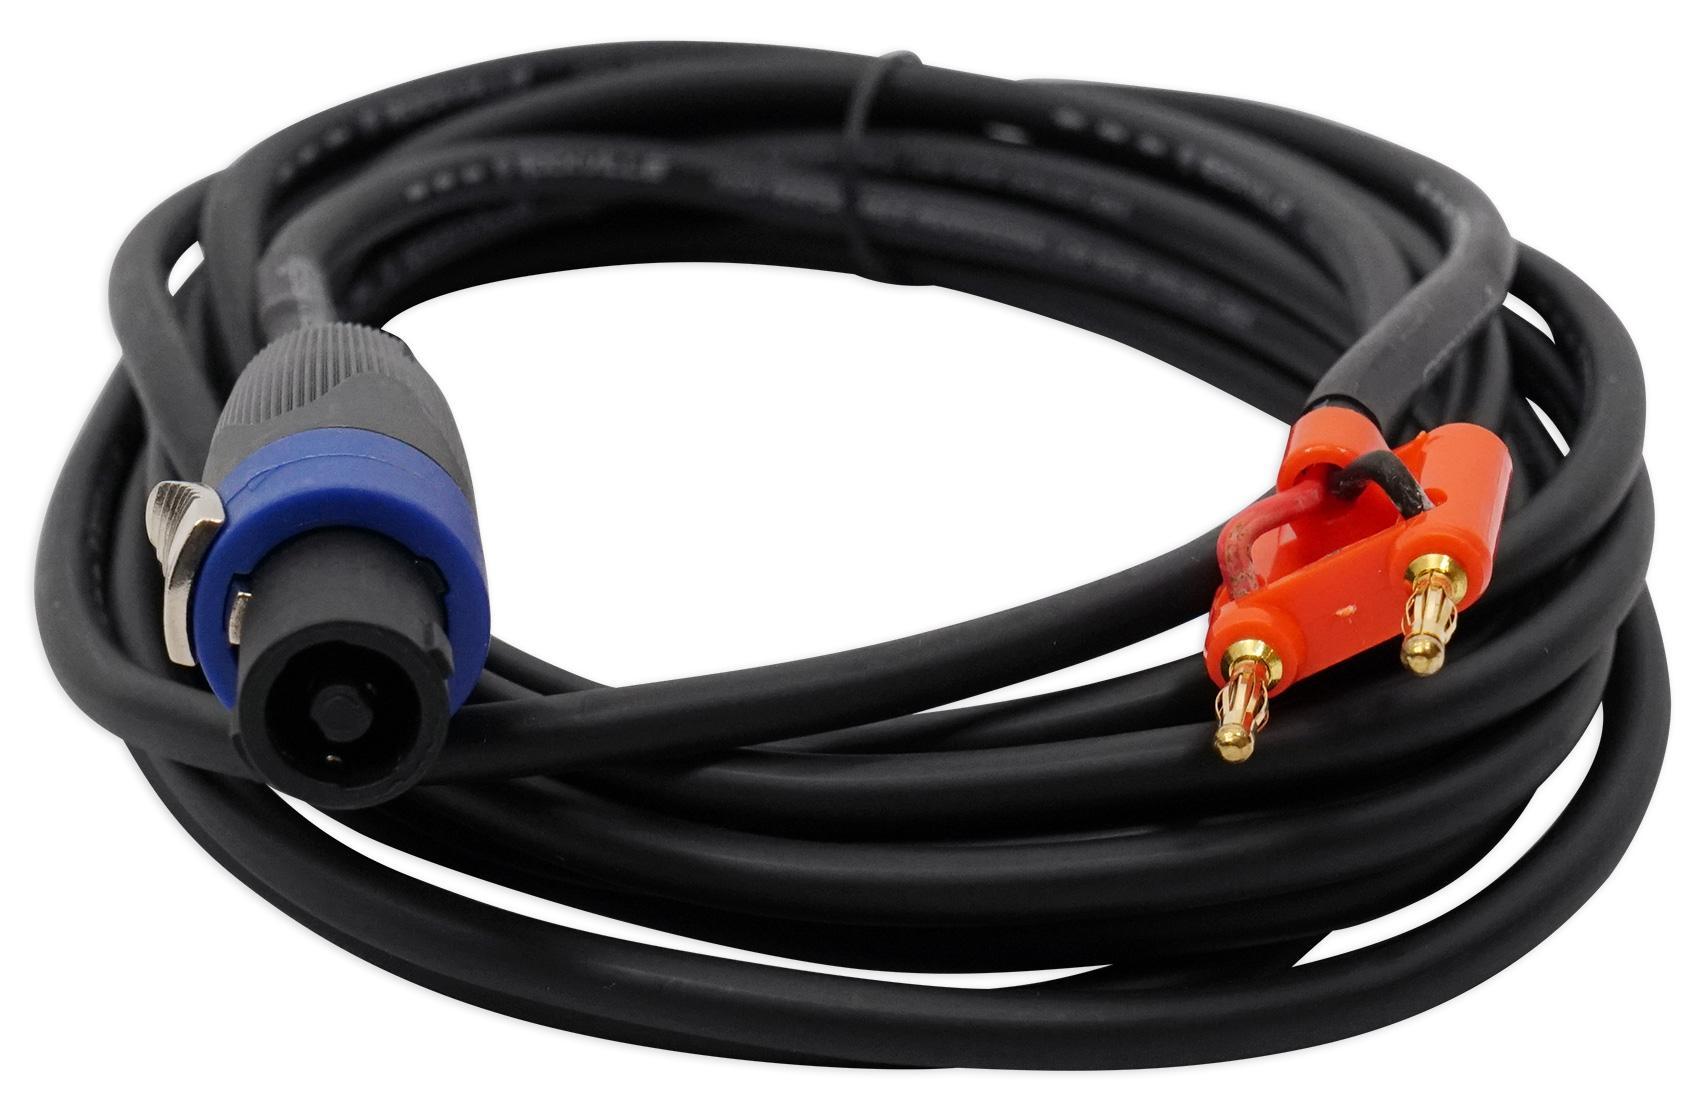 Amazon.com: Rockville RSB16 20 Foot Speakon to Banana Speaker Cable ...